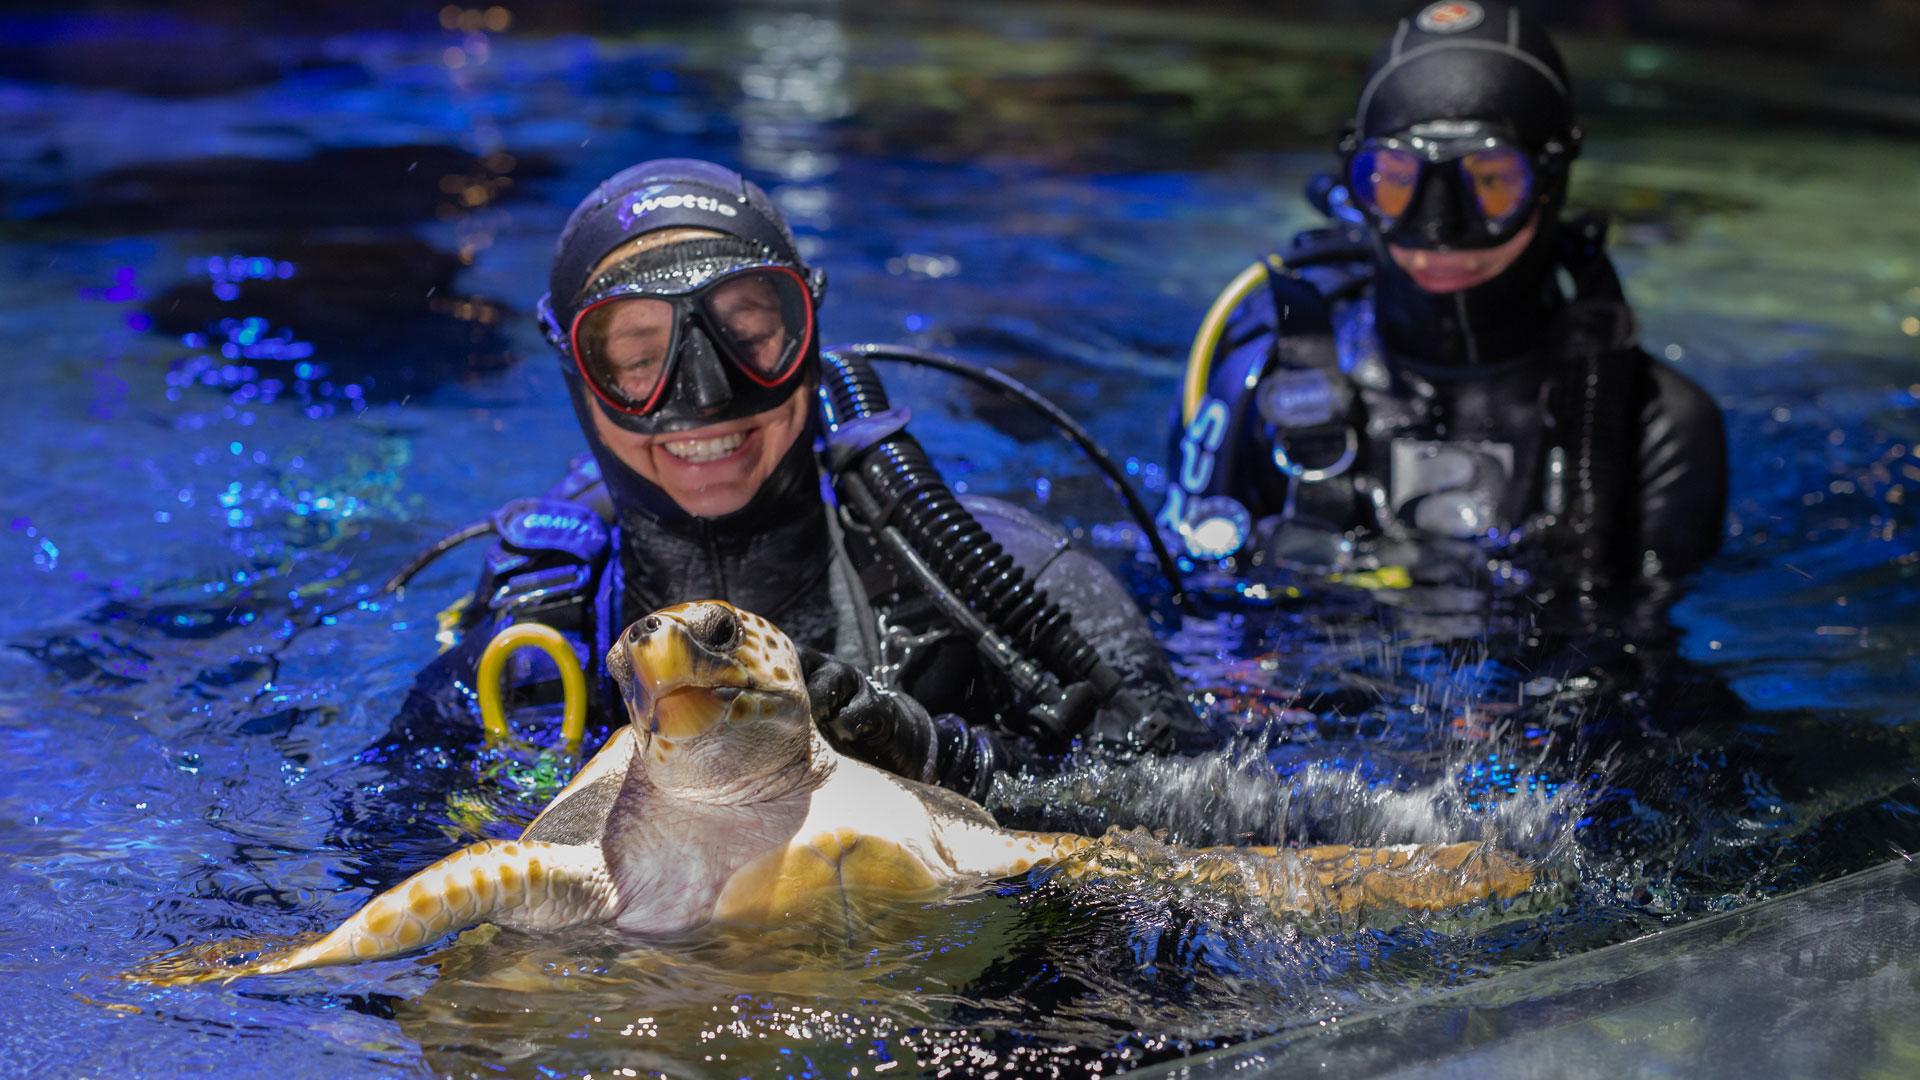 https://rfacdn.nz/zoo/assets/media/sea-turtle-kelly-tarltons-gallery-1.jpg